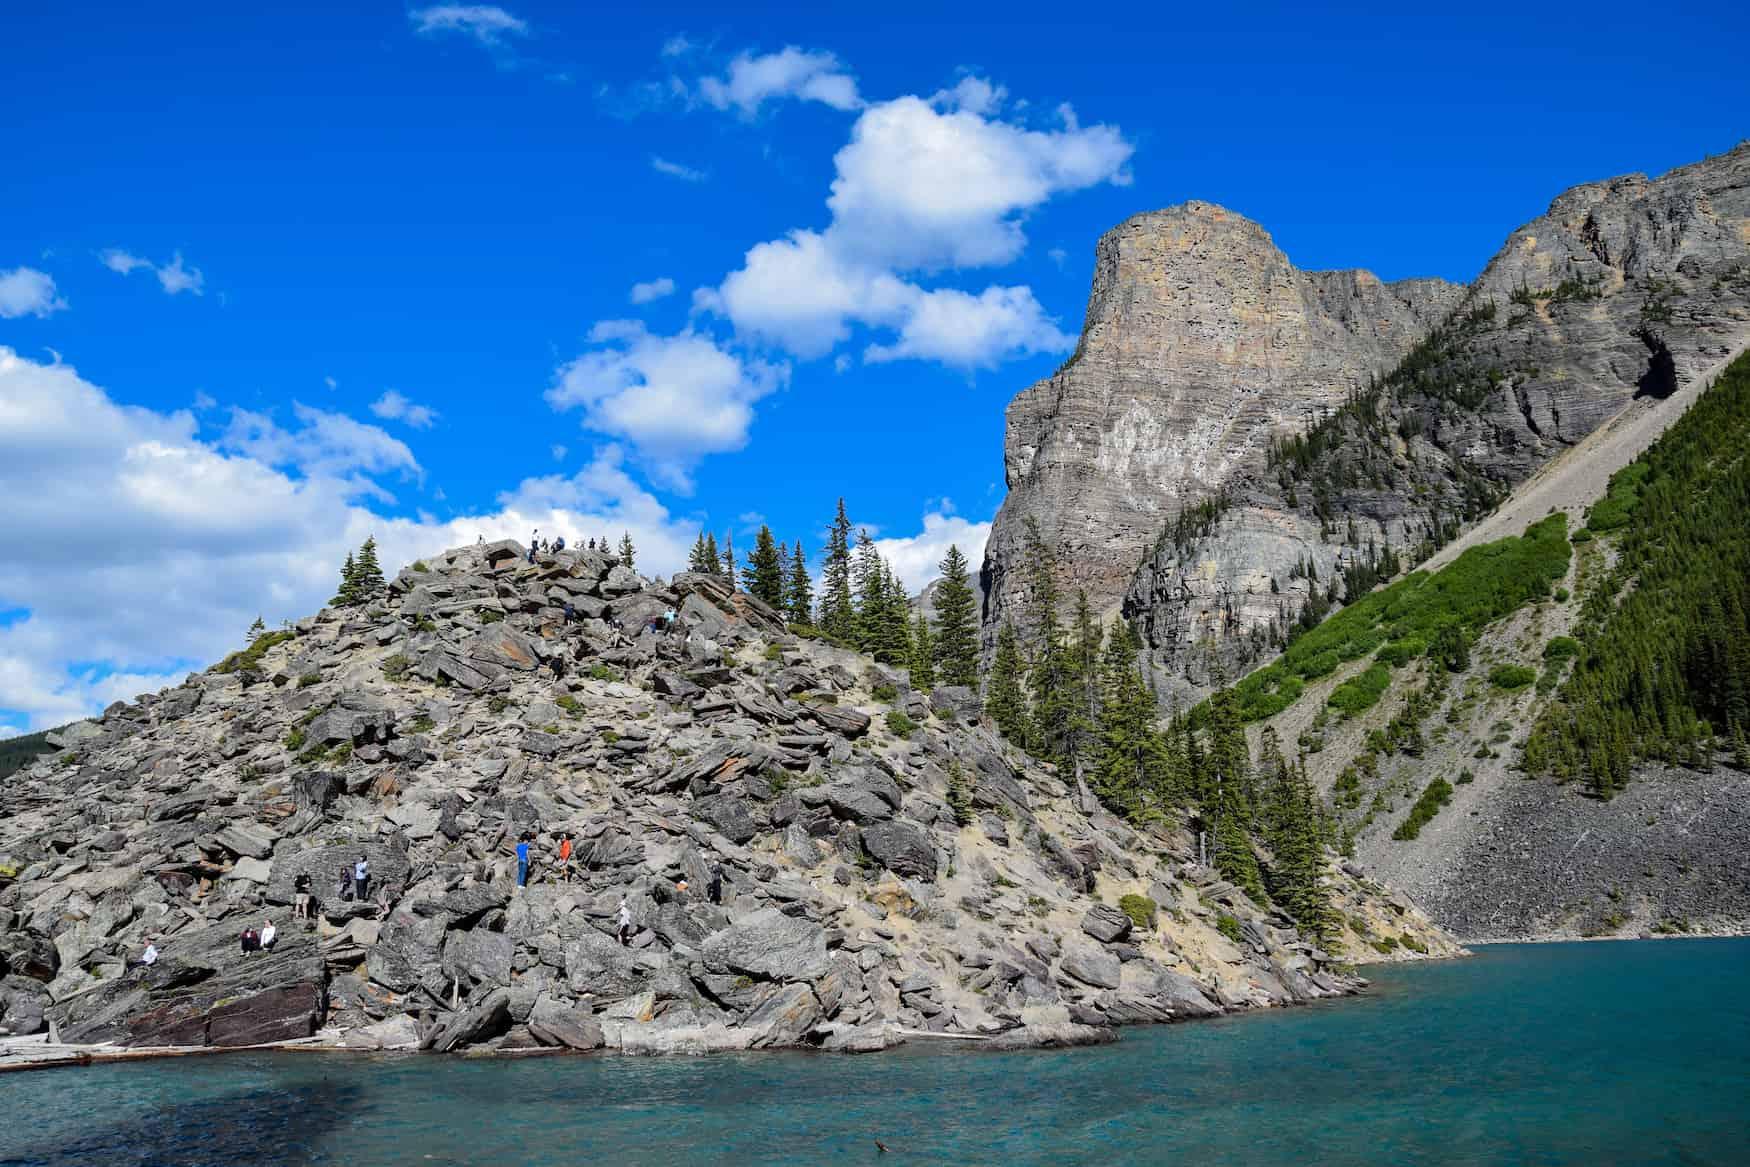 Rockpile, Moraine Lake, Banff National Park, Alberta